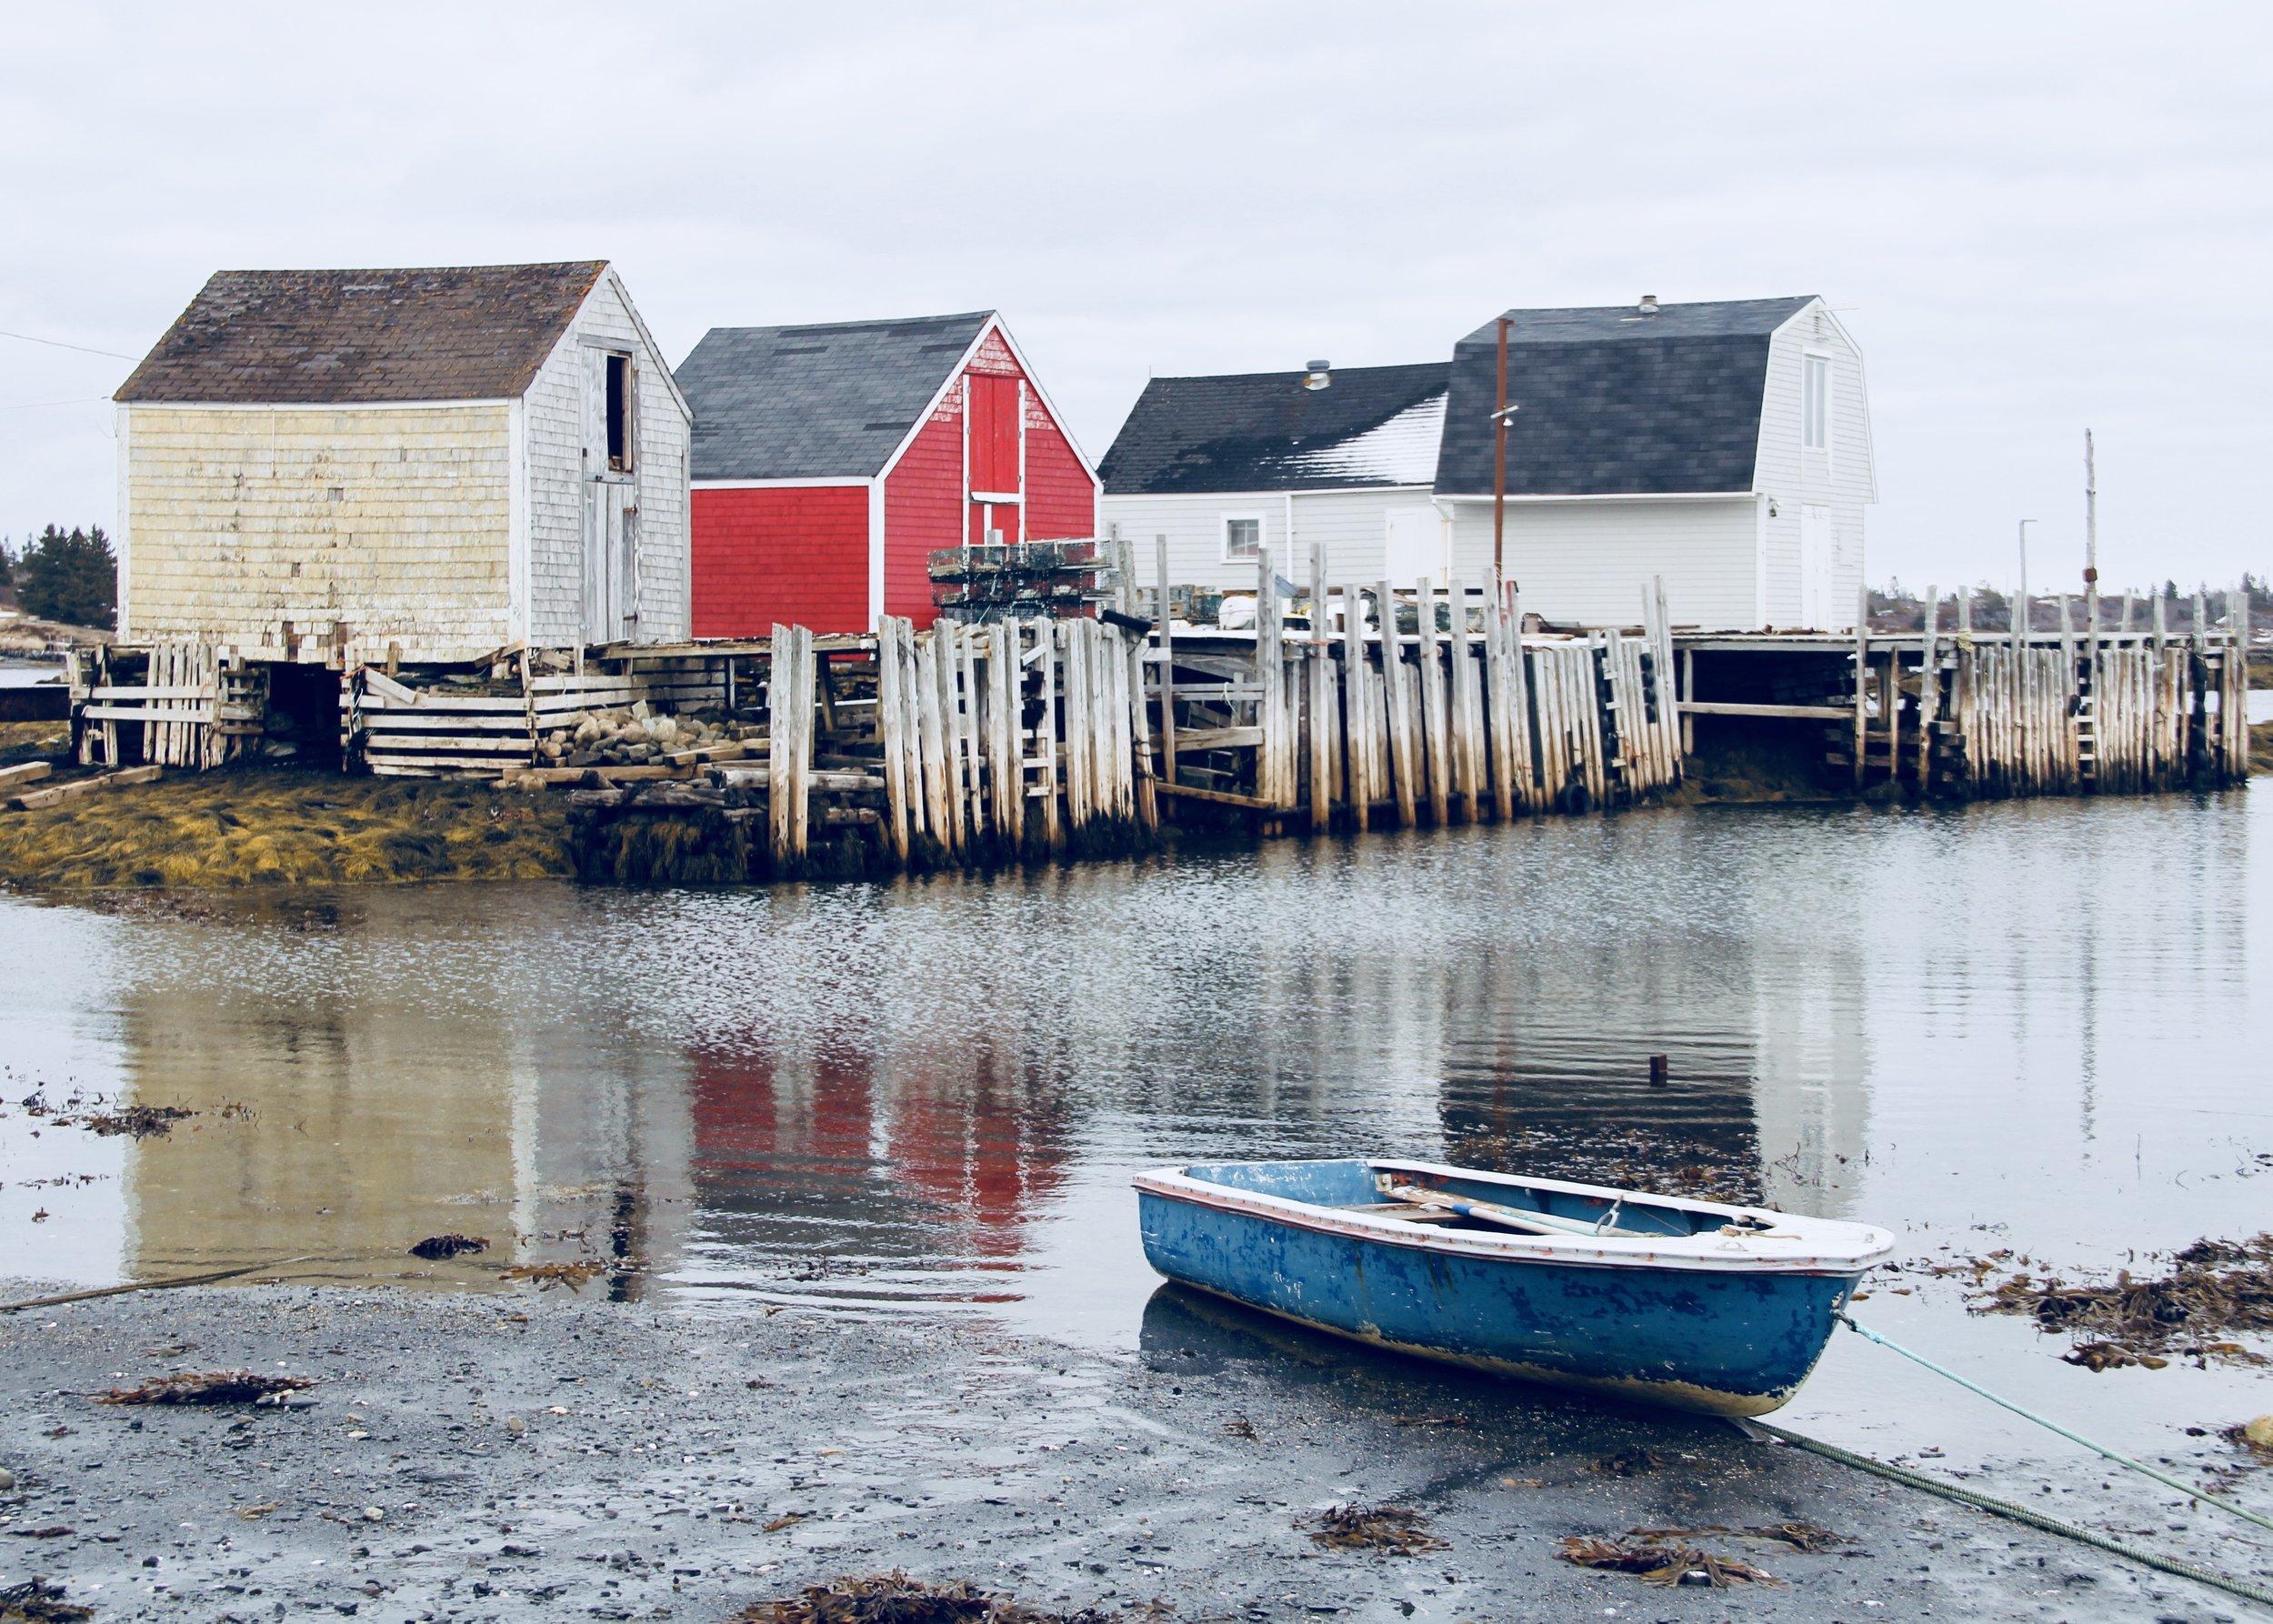 Old fishing shacks at the Point, Blue Rocks, Nova Scotia - Still a working fishing village.